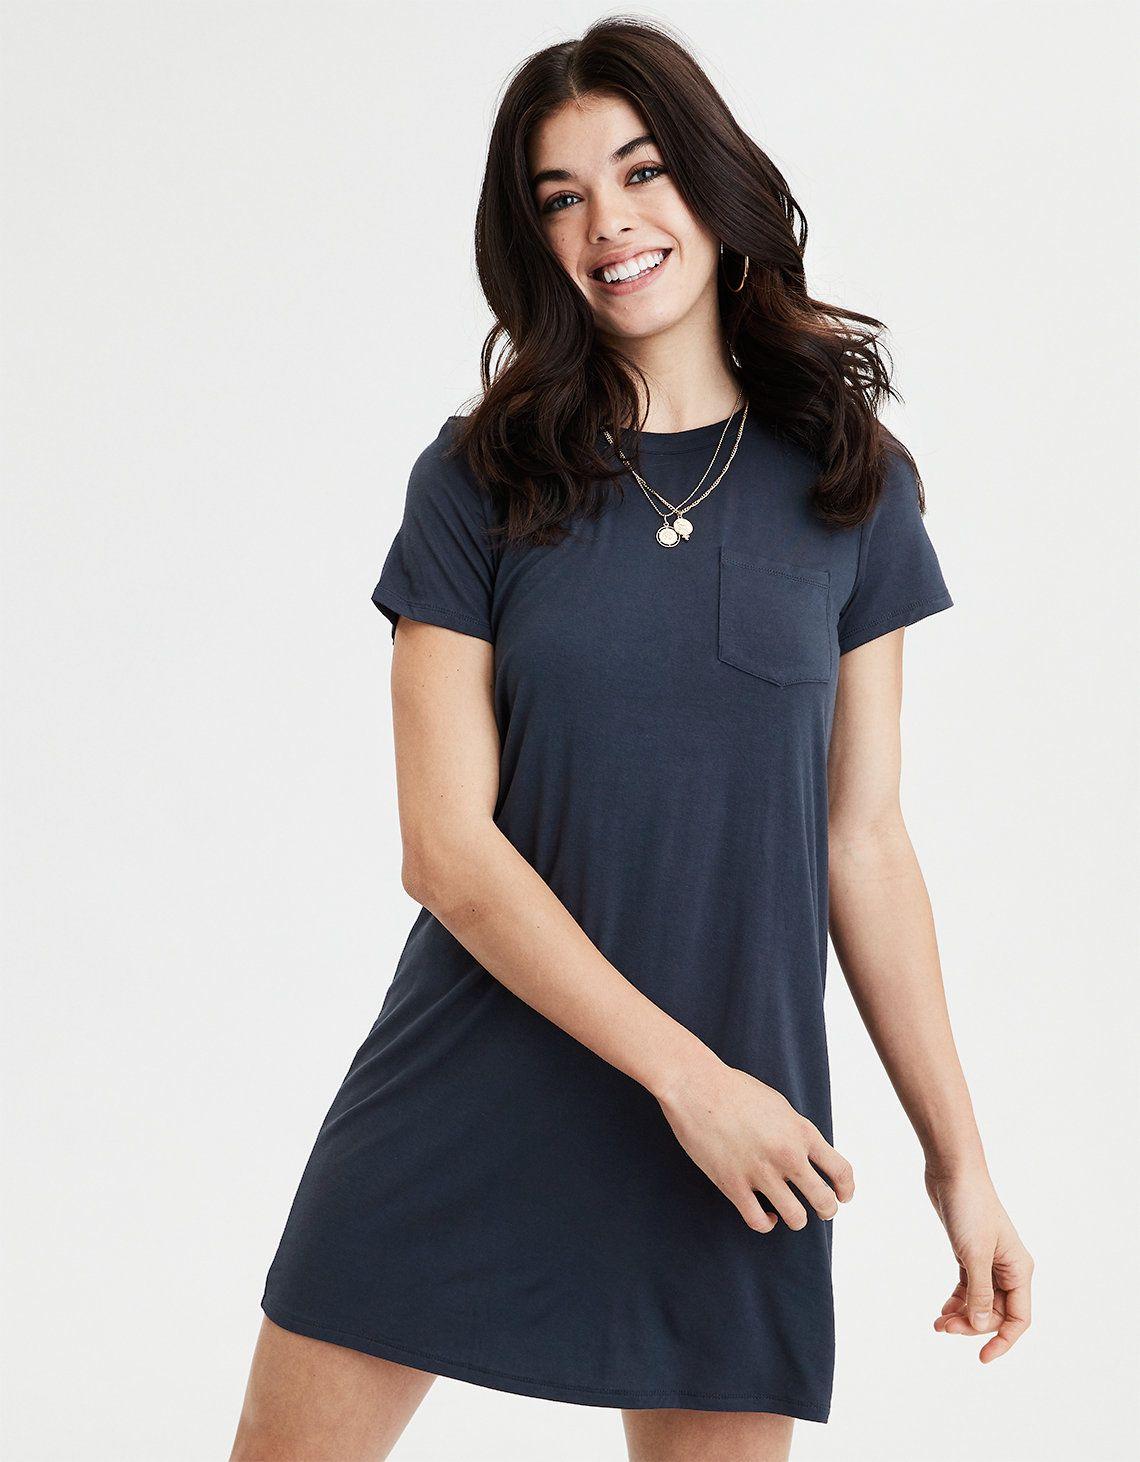 Ae Knit T Shirt Dress Maxi Wrap Dress T Shirt Dress Knitted Tshirt [ 1462 x 1140 Pixel ]